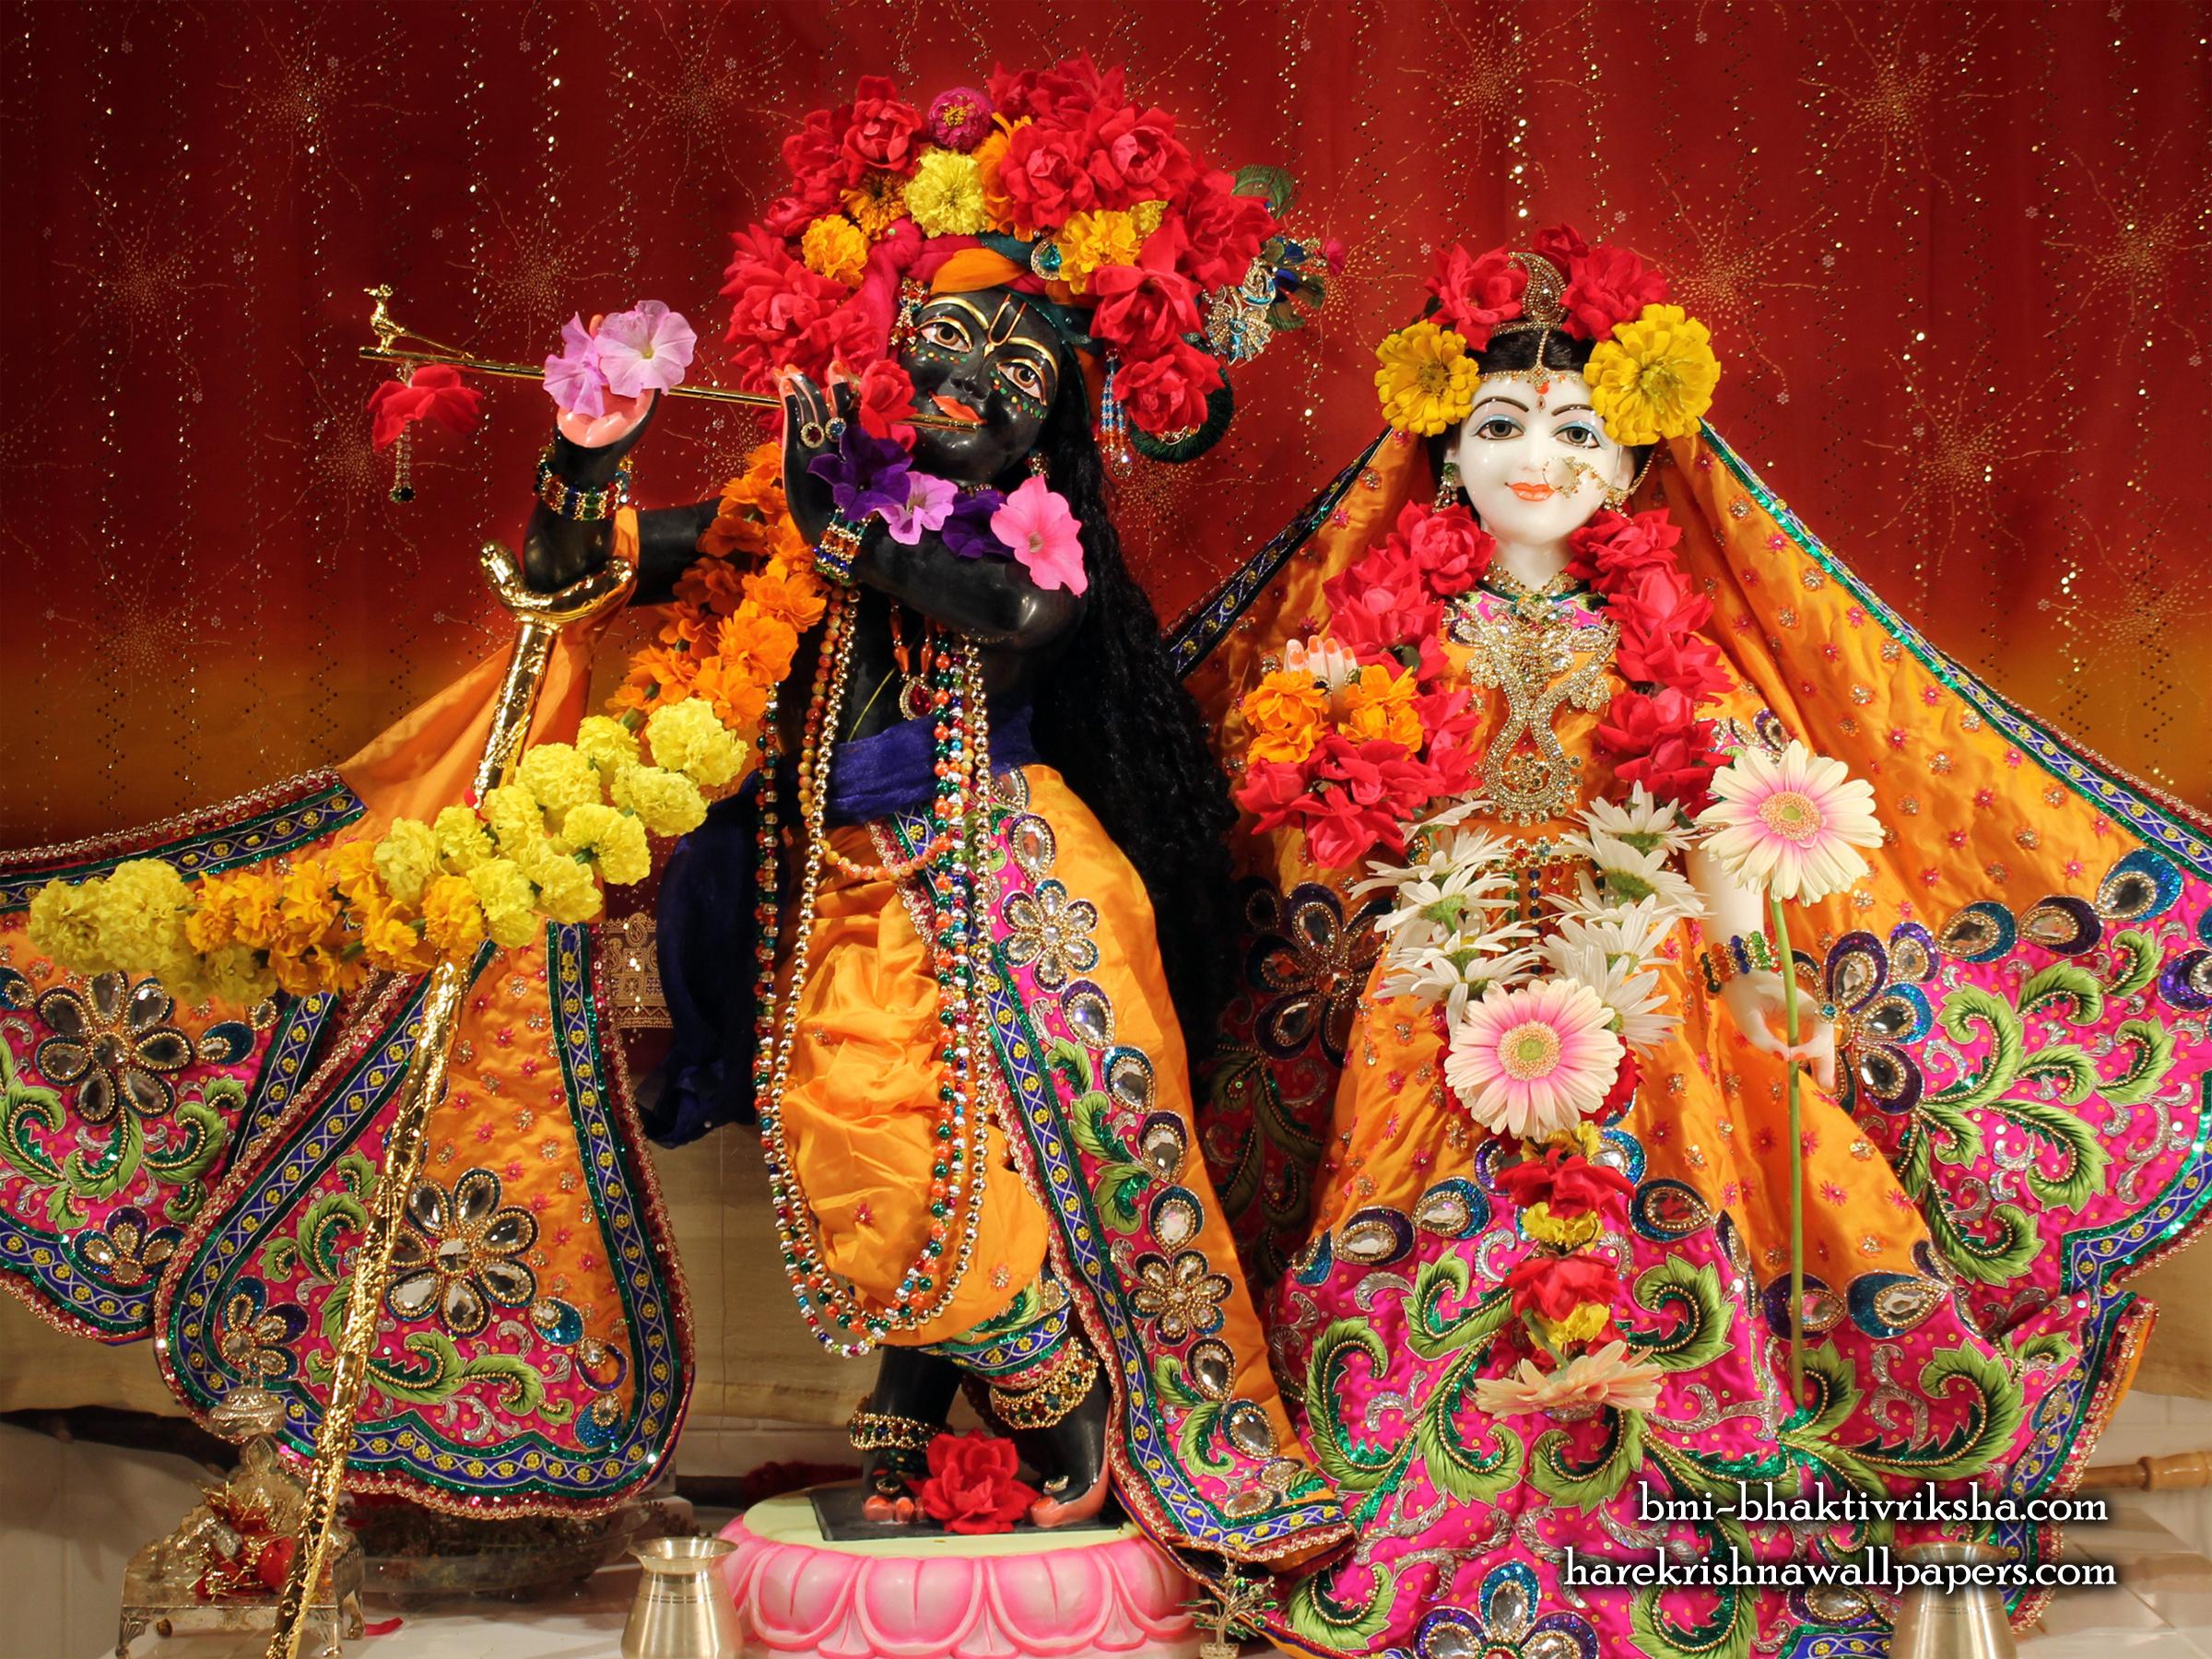 Sri Sri Radha Shyamsundar Wallpaper (001) Size 2400x1800 Download